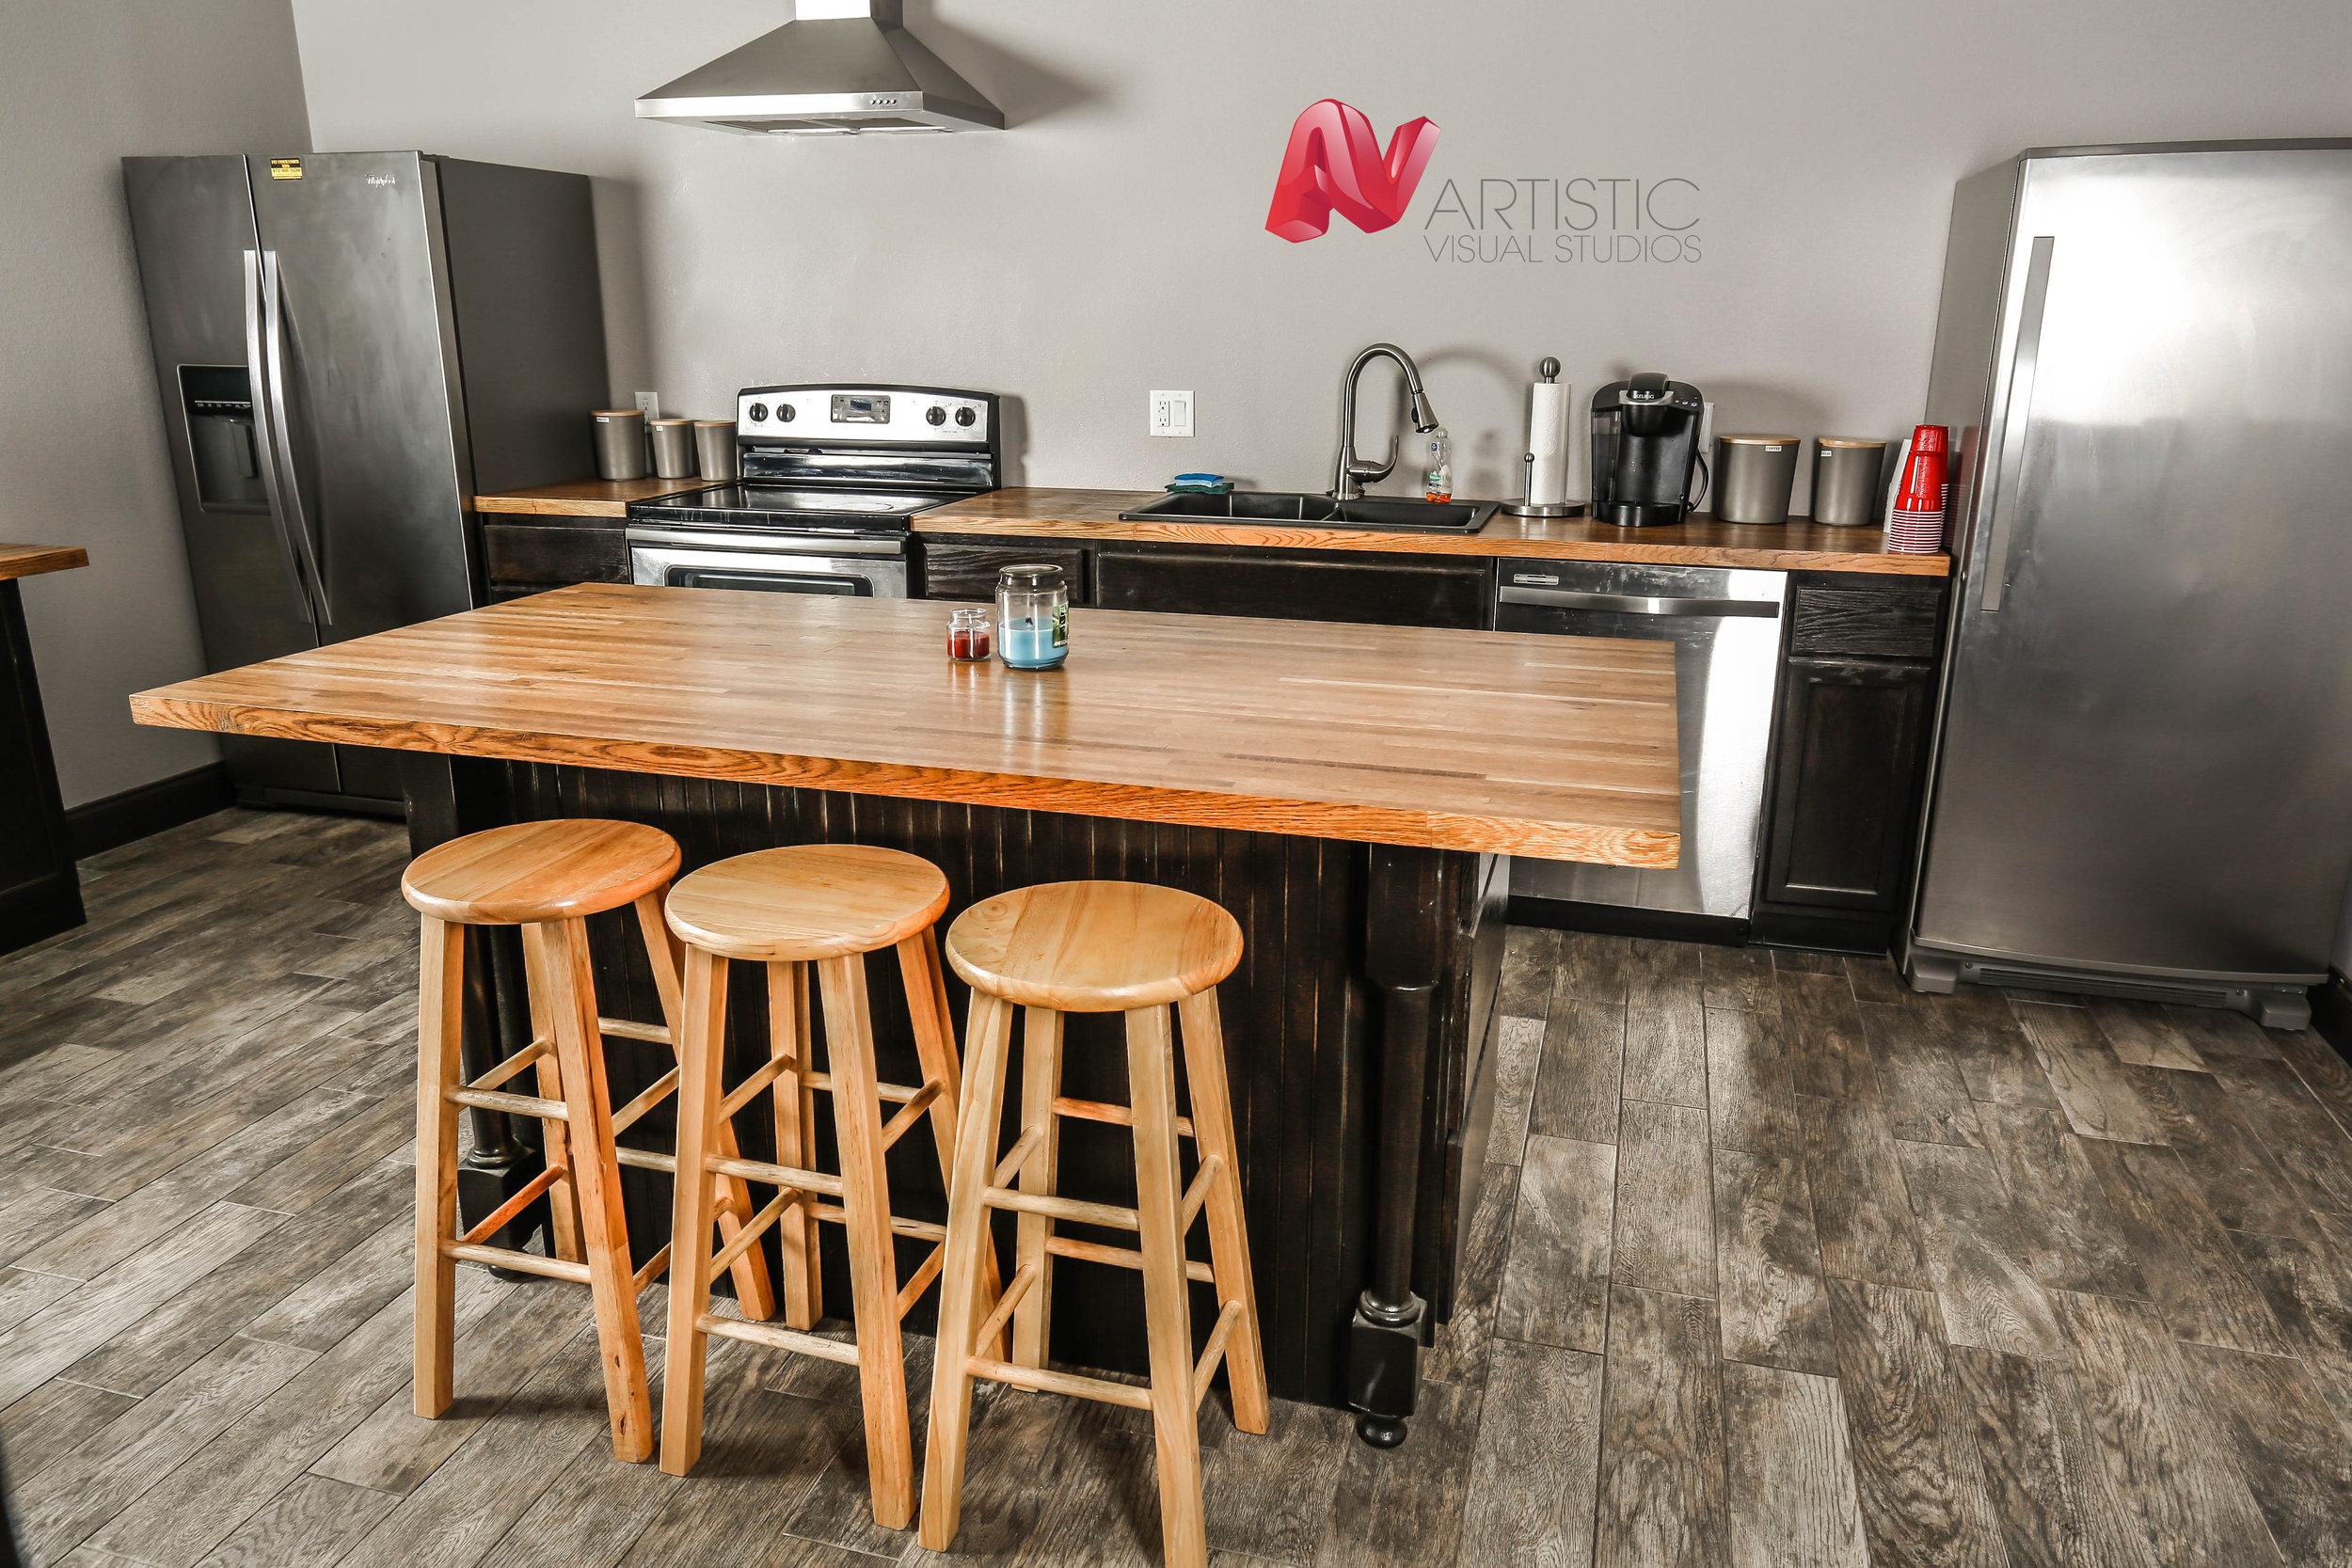 Artistic Visual Studios Full Size Kitchen Area.jpg